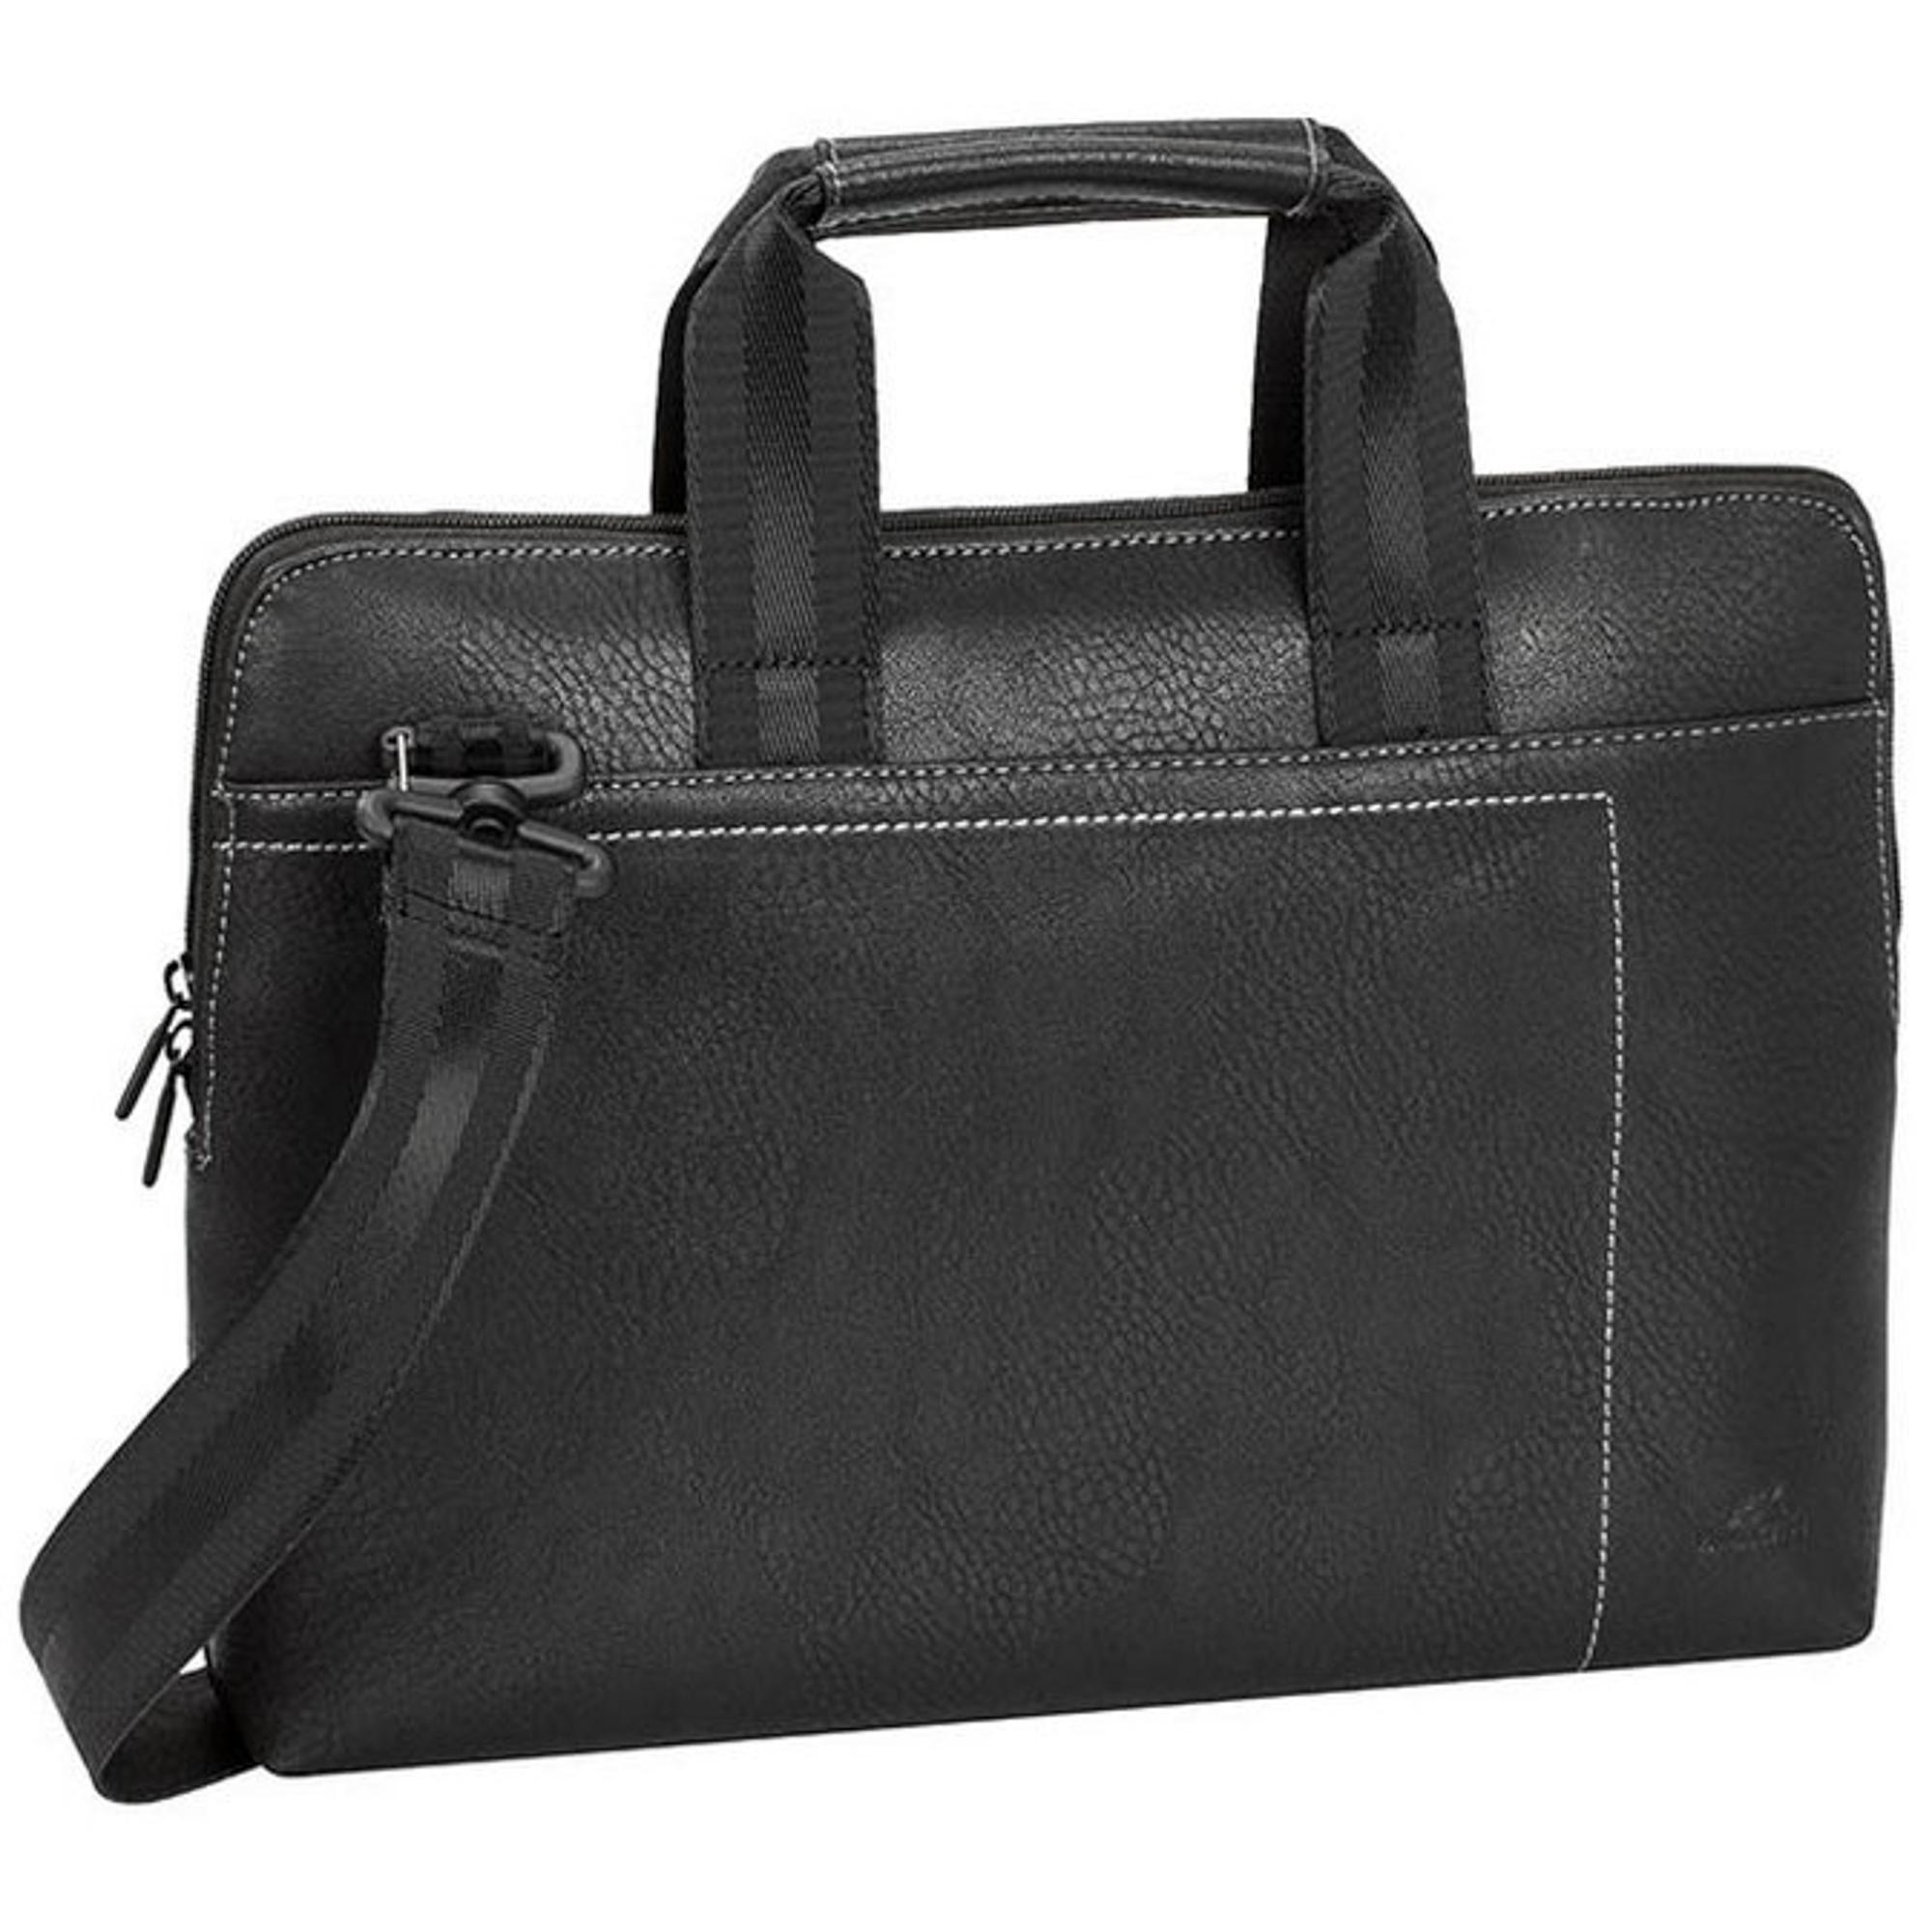 сумка для ноутбука rivacase 8920 13 3 black Сумка для ноутбука RIVACASE 8920 Black